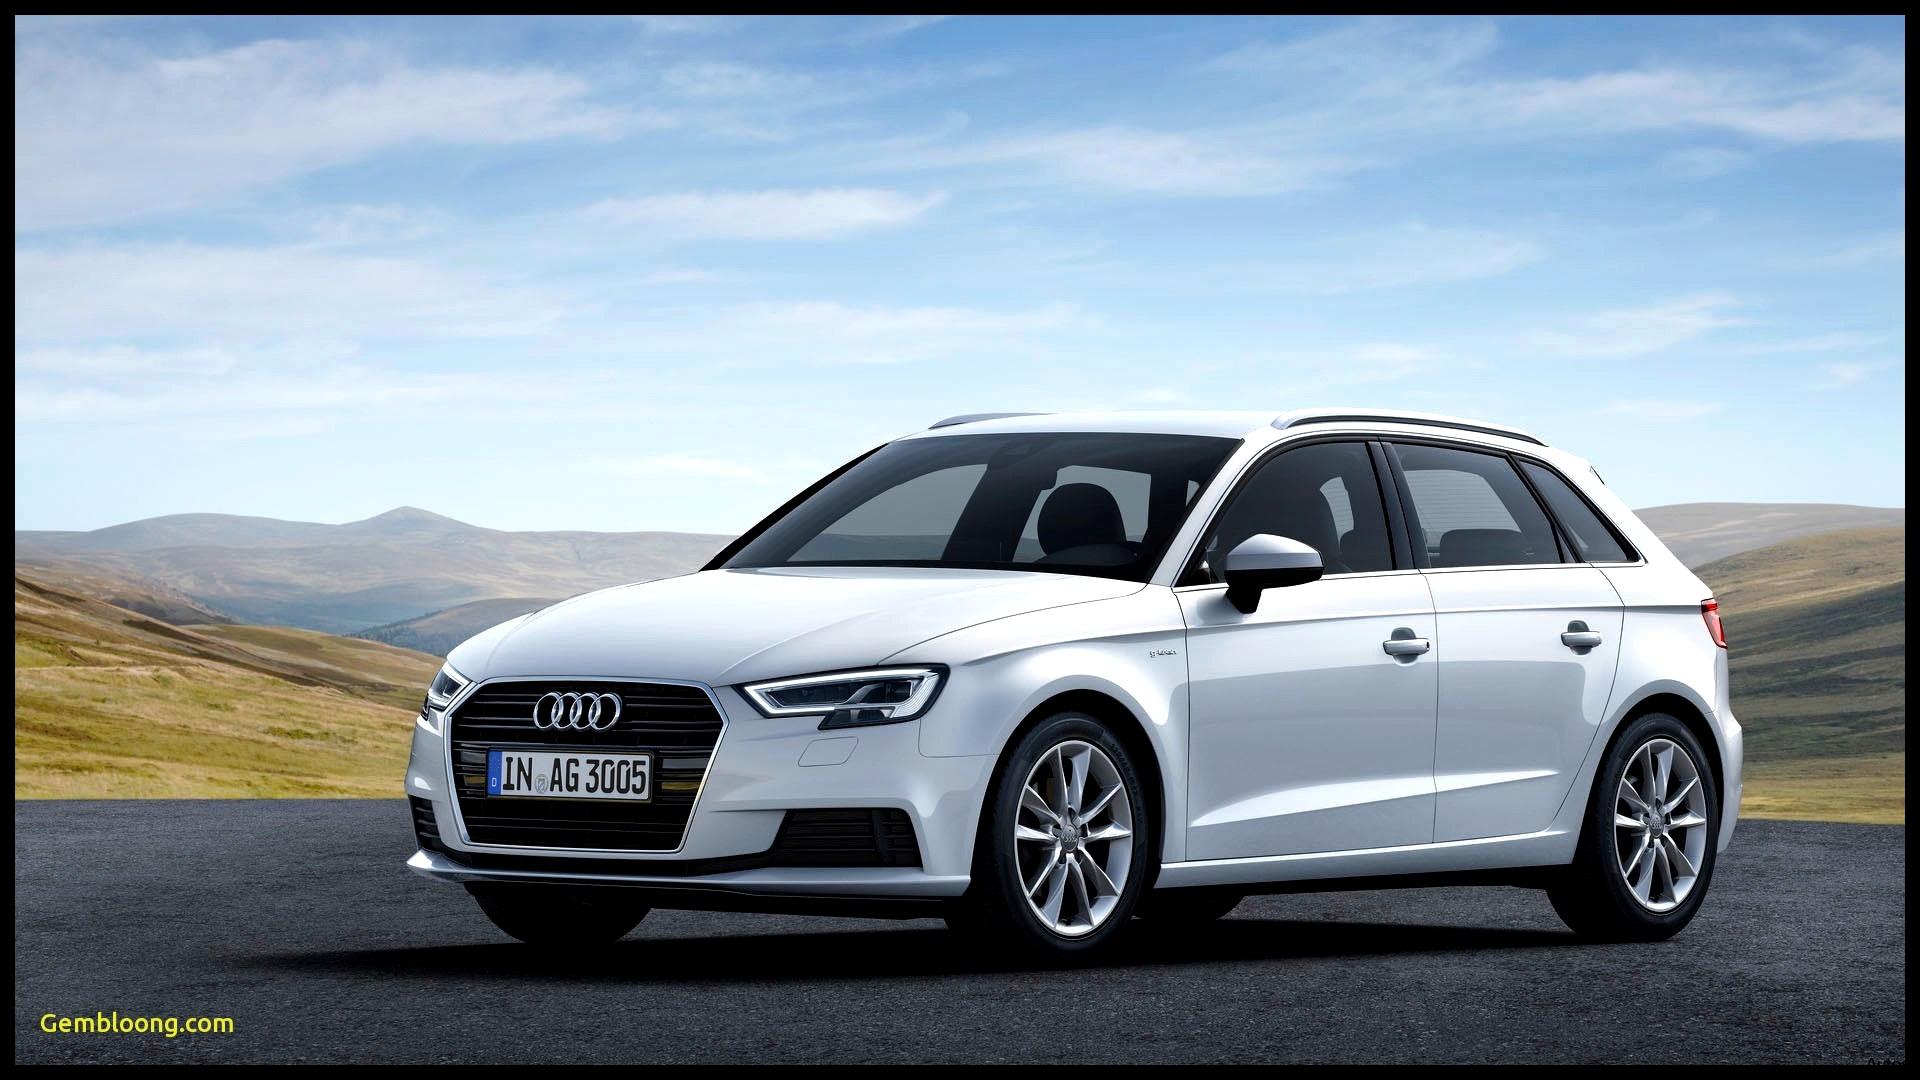 2018 Audi Q3 New Interior Audi Q3 Schwarz 2017 Awesome Audi A3 Sportback E Tron 2017